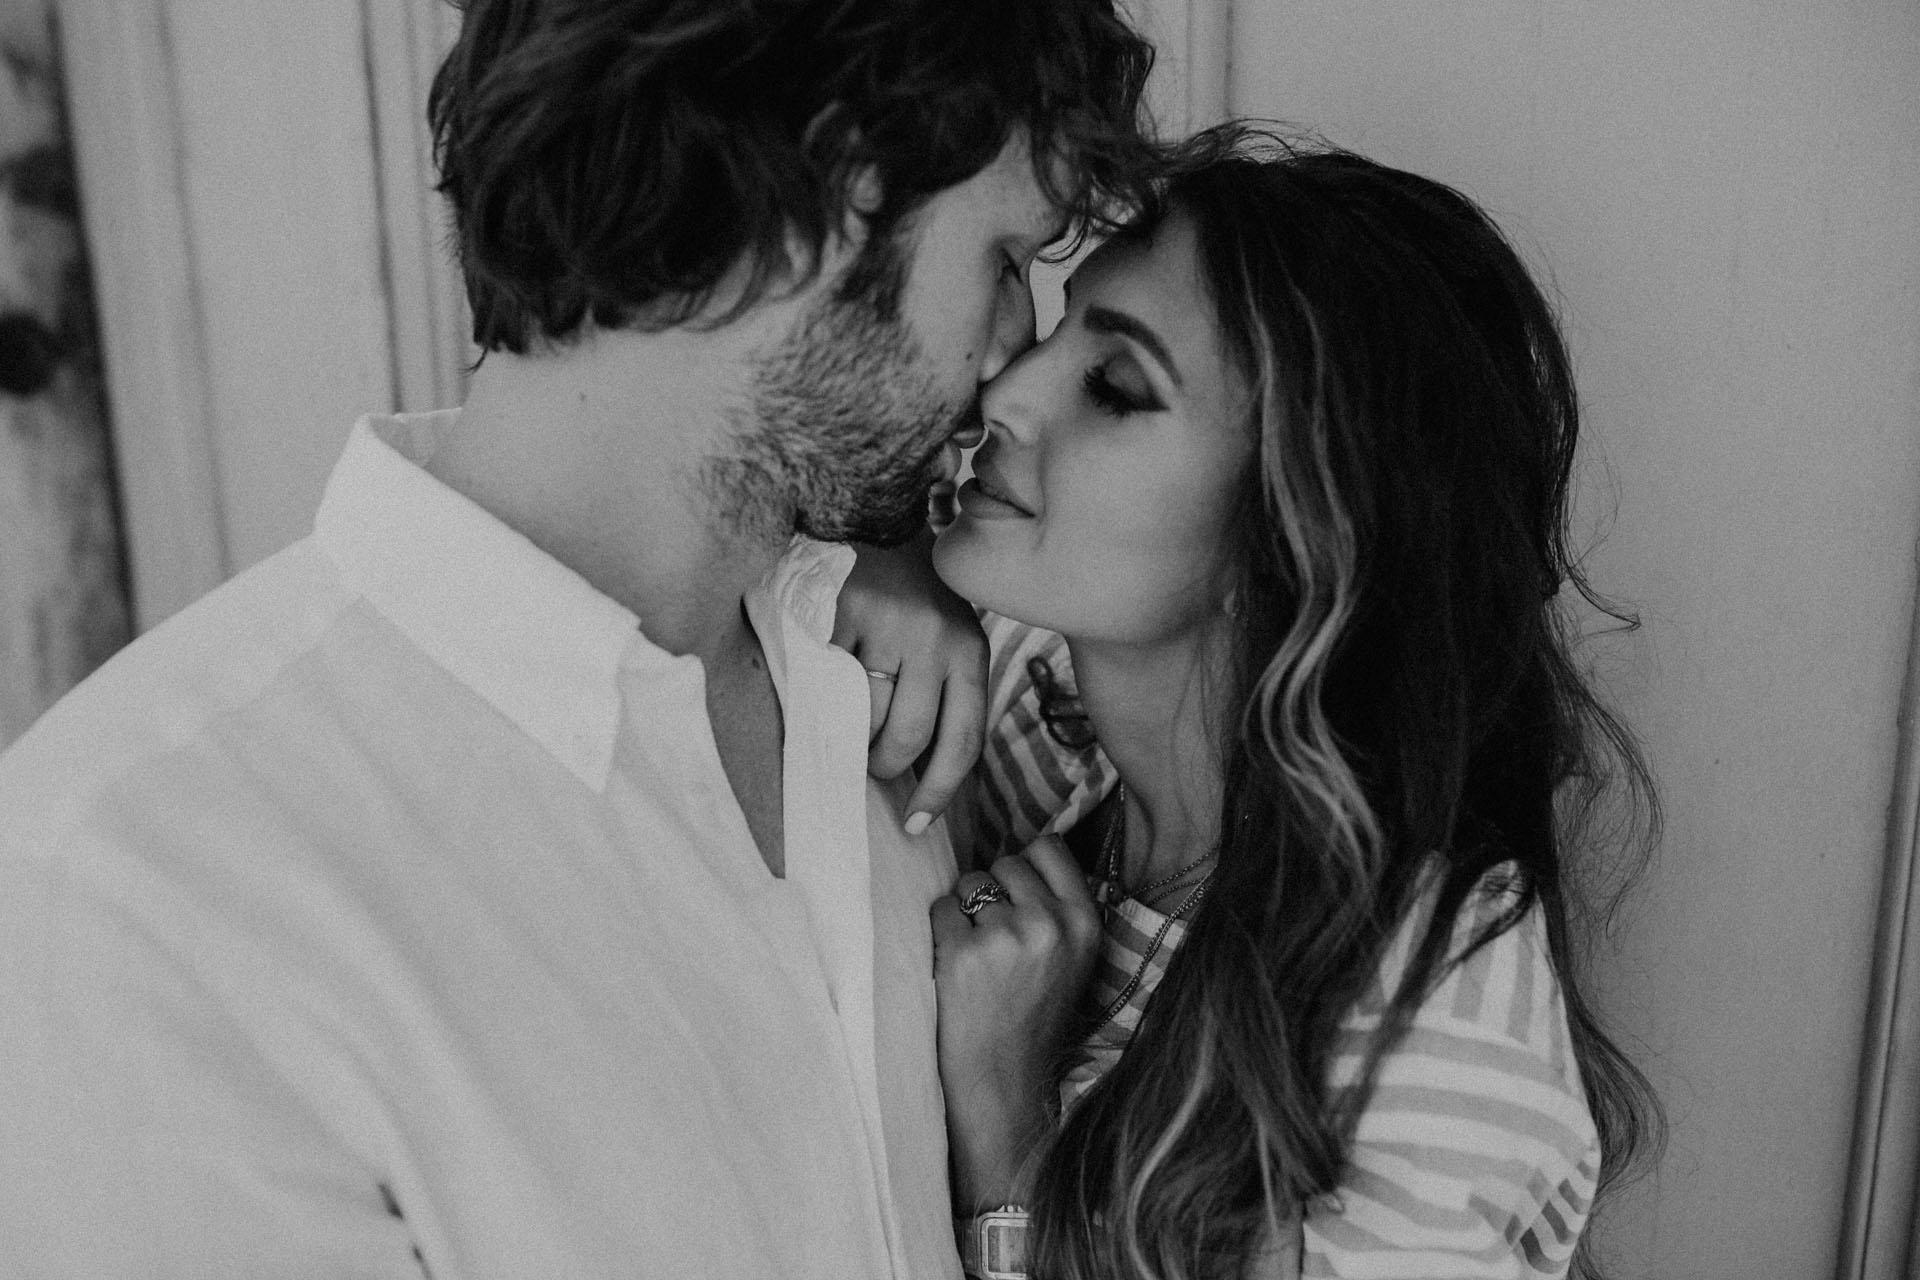 coupleshooting-roma-hochzeitsfotografen-wien-agnesundandi-6